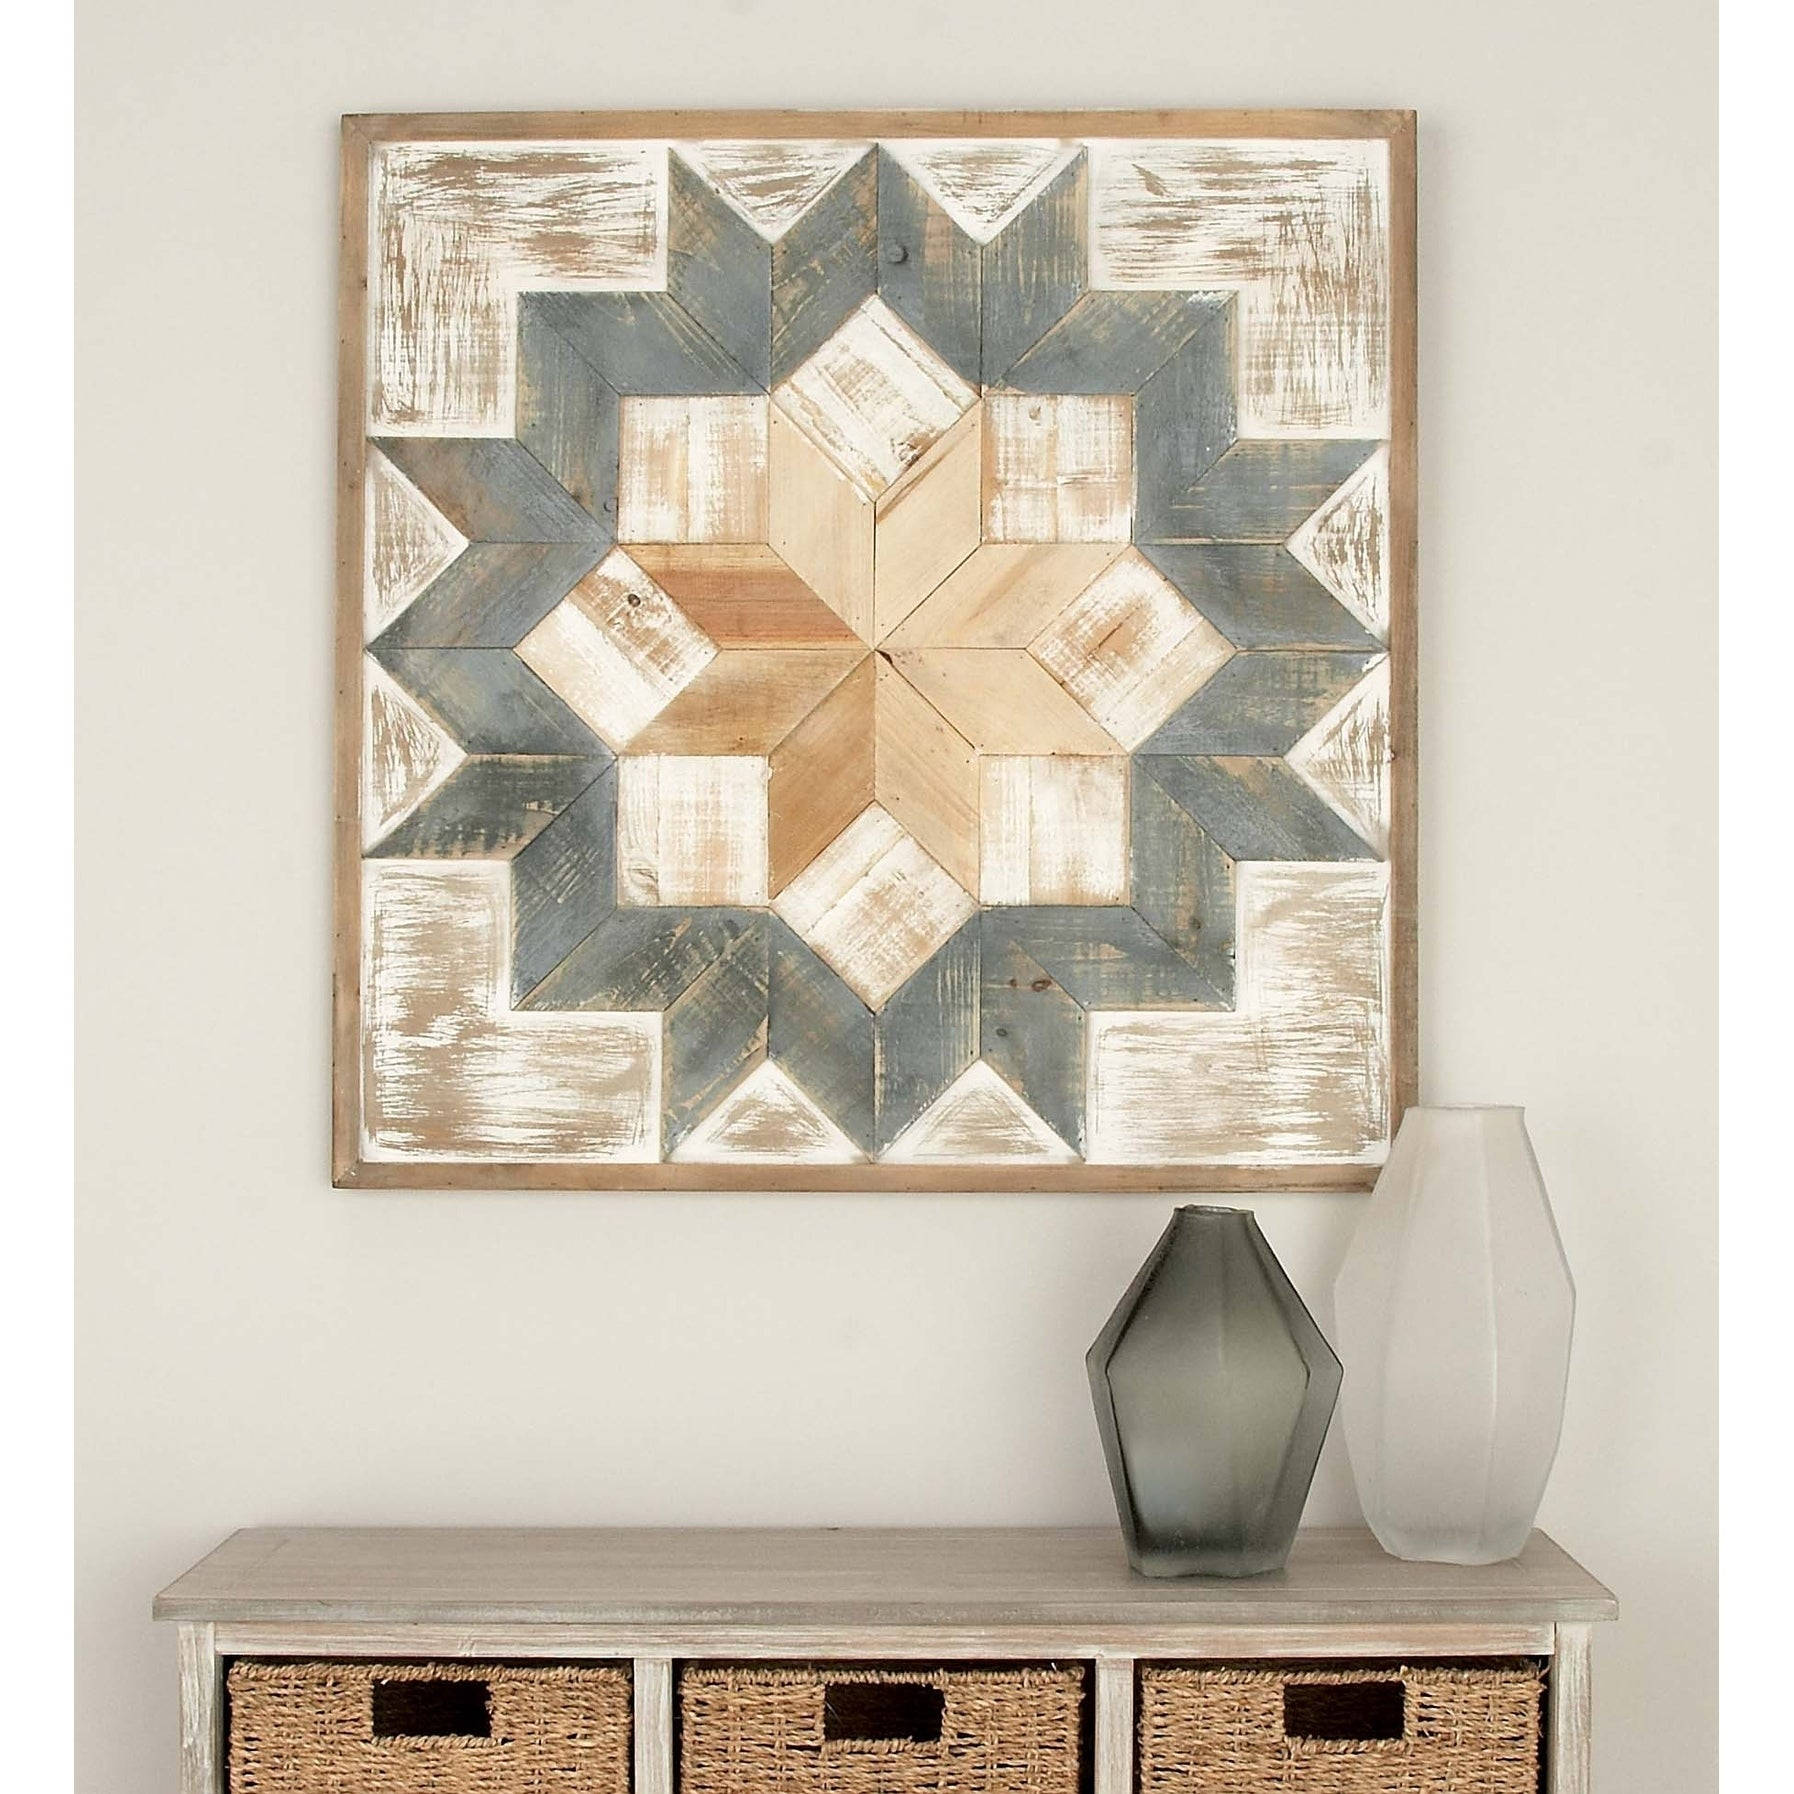 Farmhouse 31 X 31 Inch Geometric Wooden Wall Art By Studio 350 Green Brown White